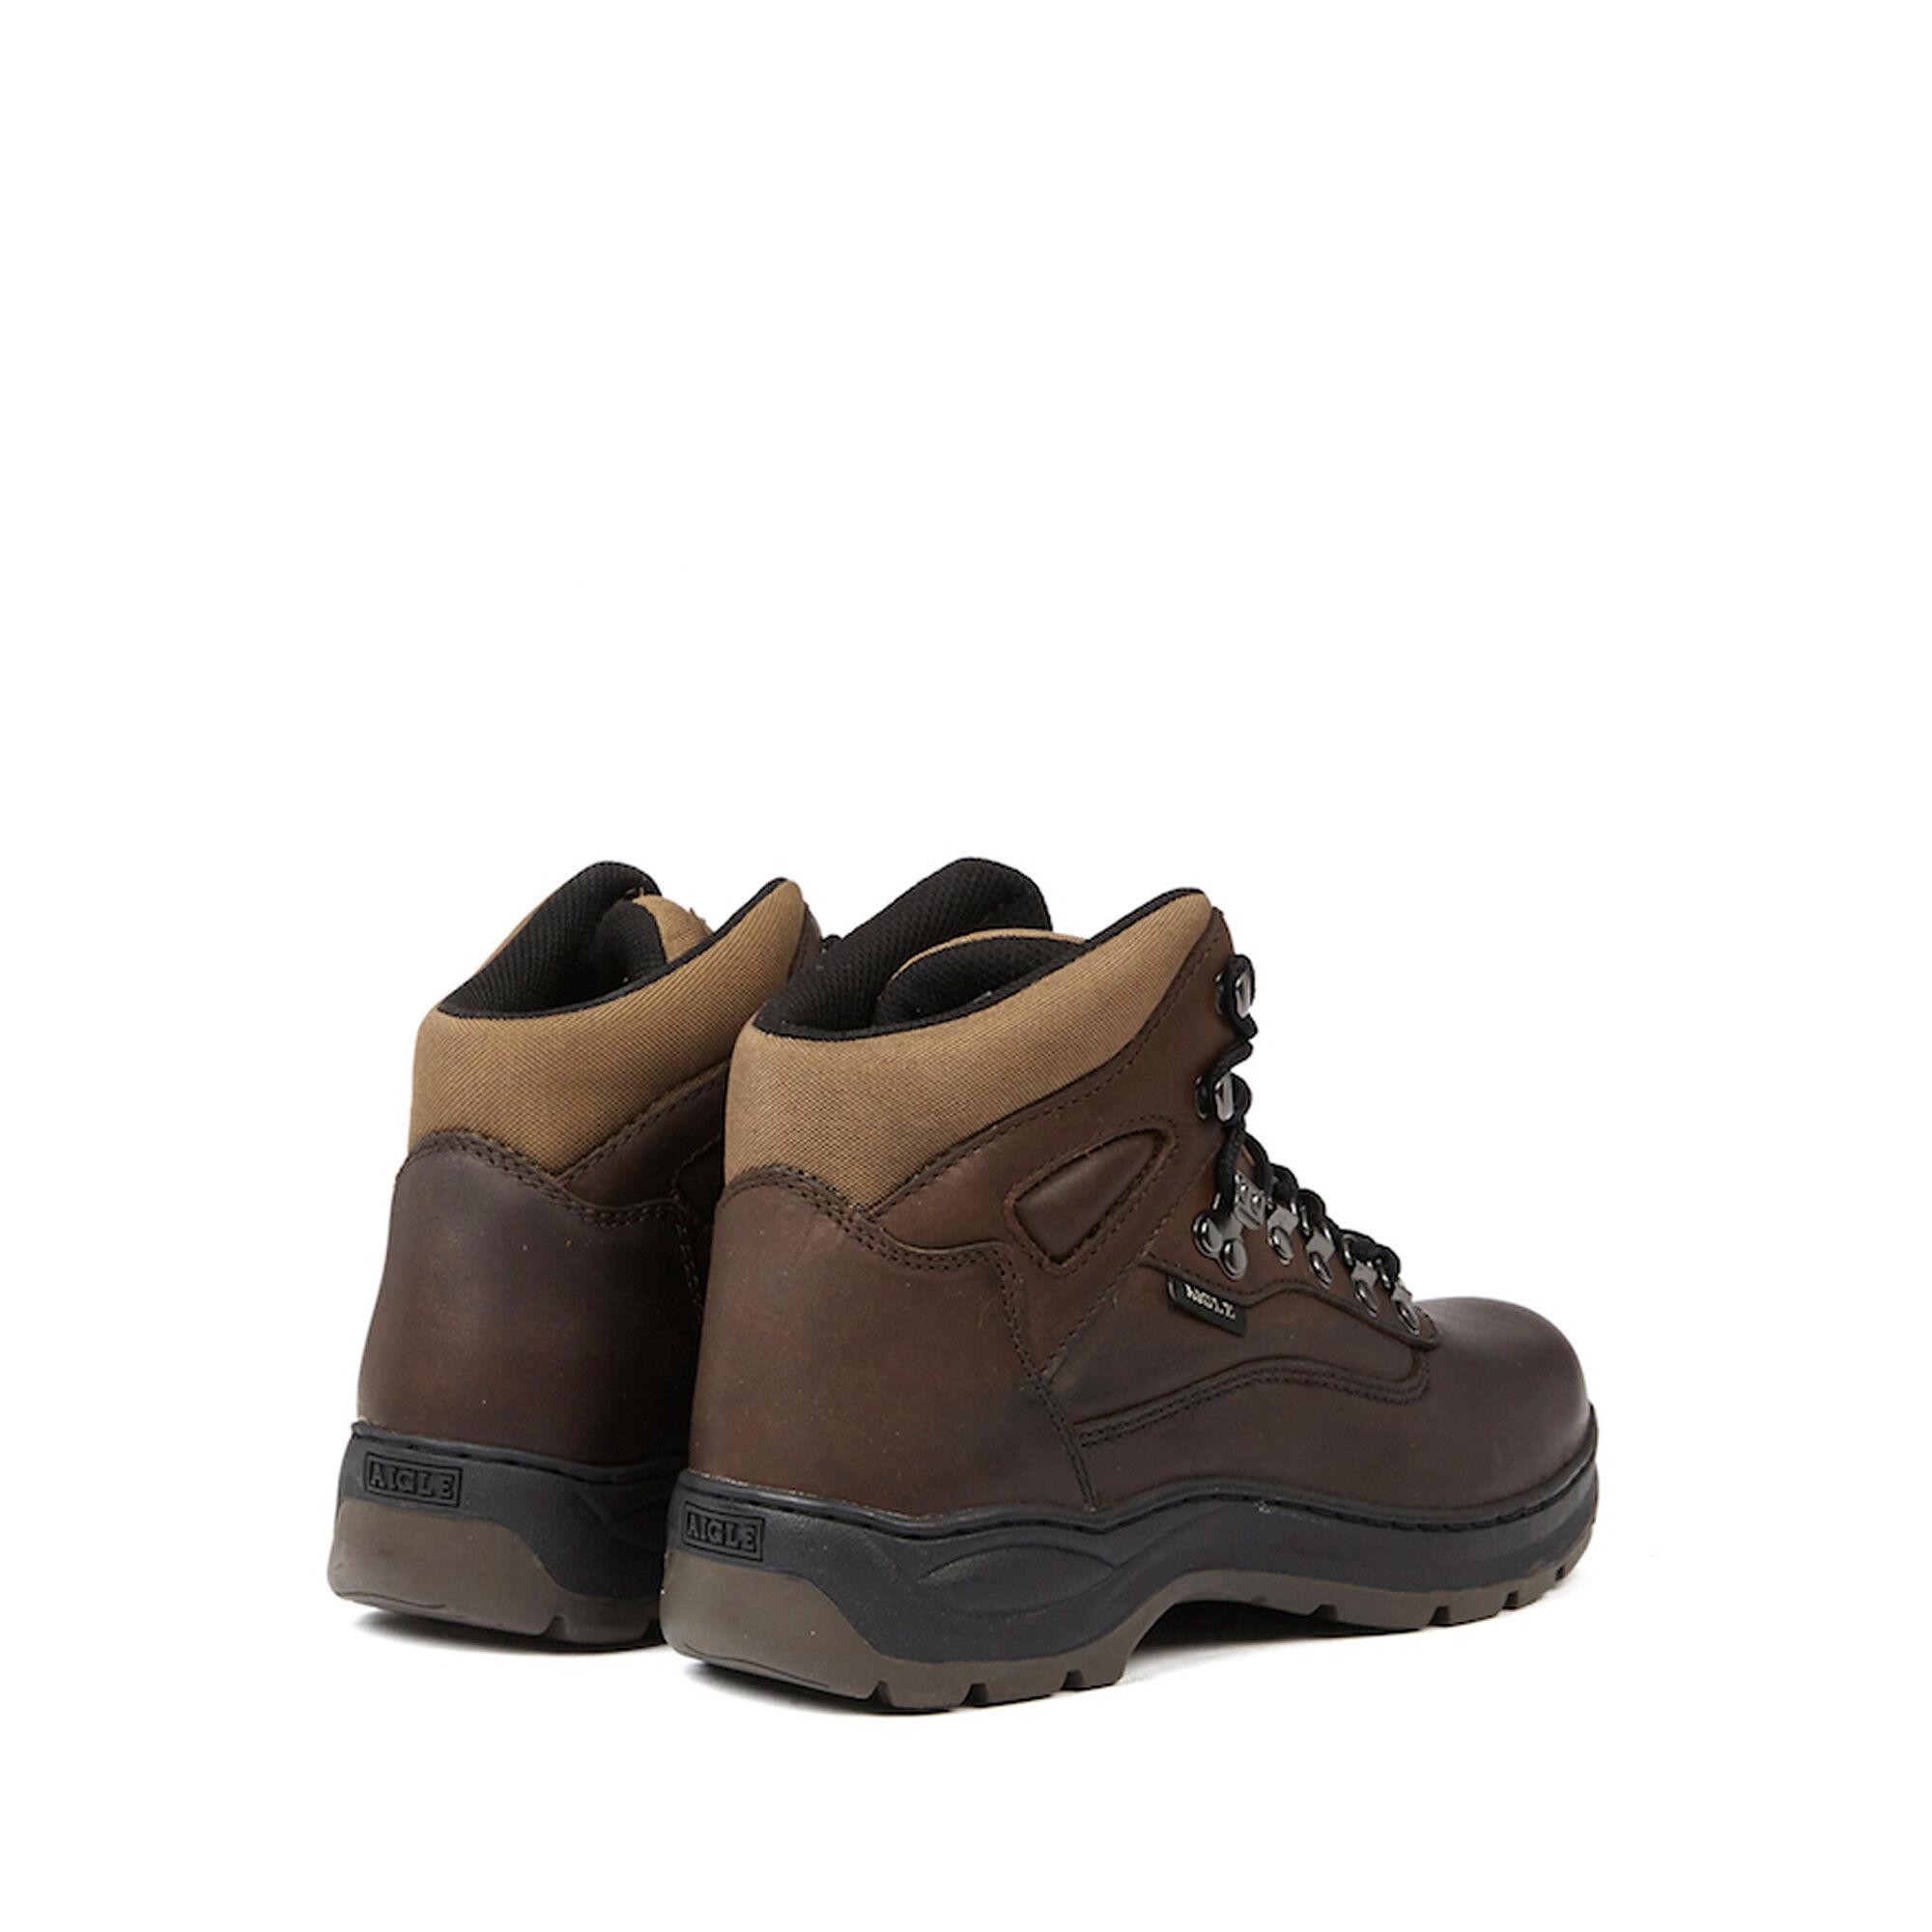 ea8addd2fe9b5 Chaussures cuir cuir Chaussures homme homme AIGLE d440a1 ...